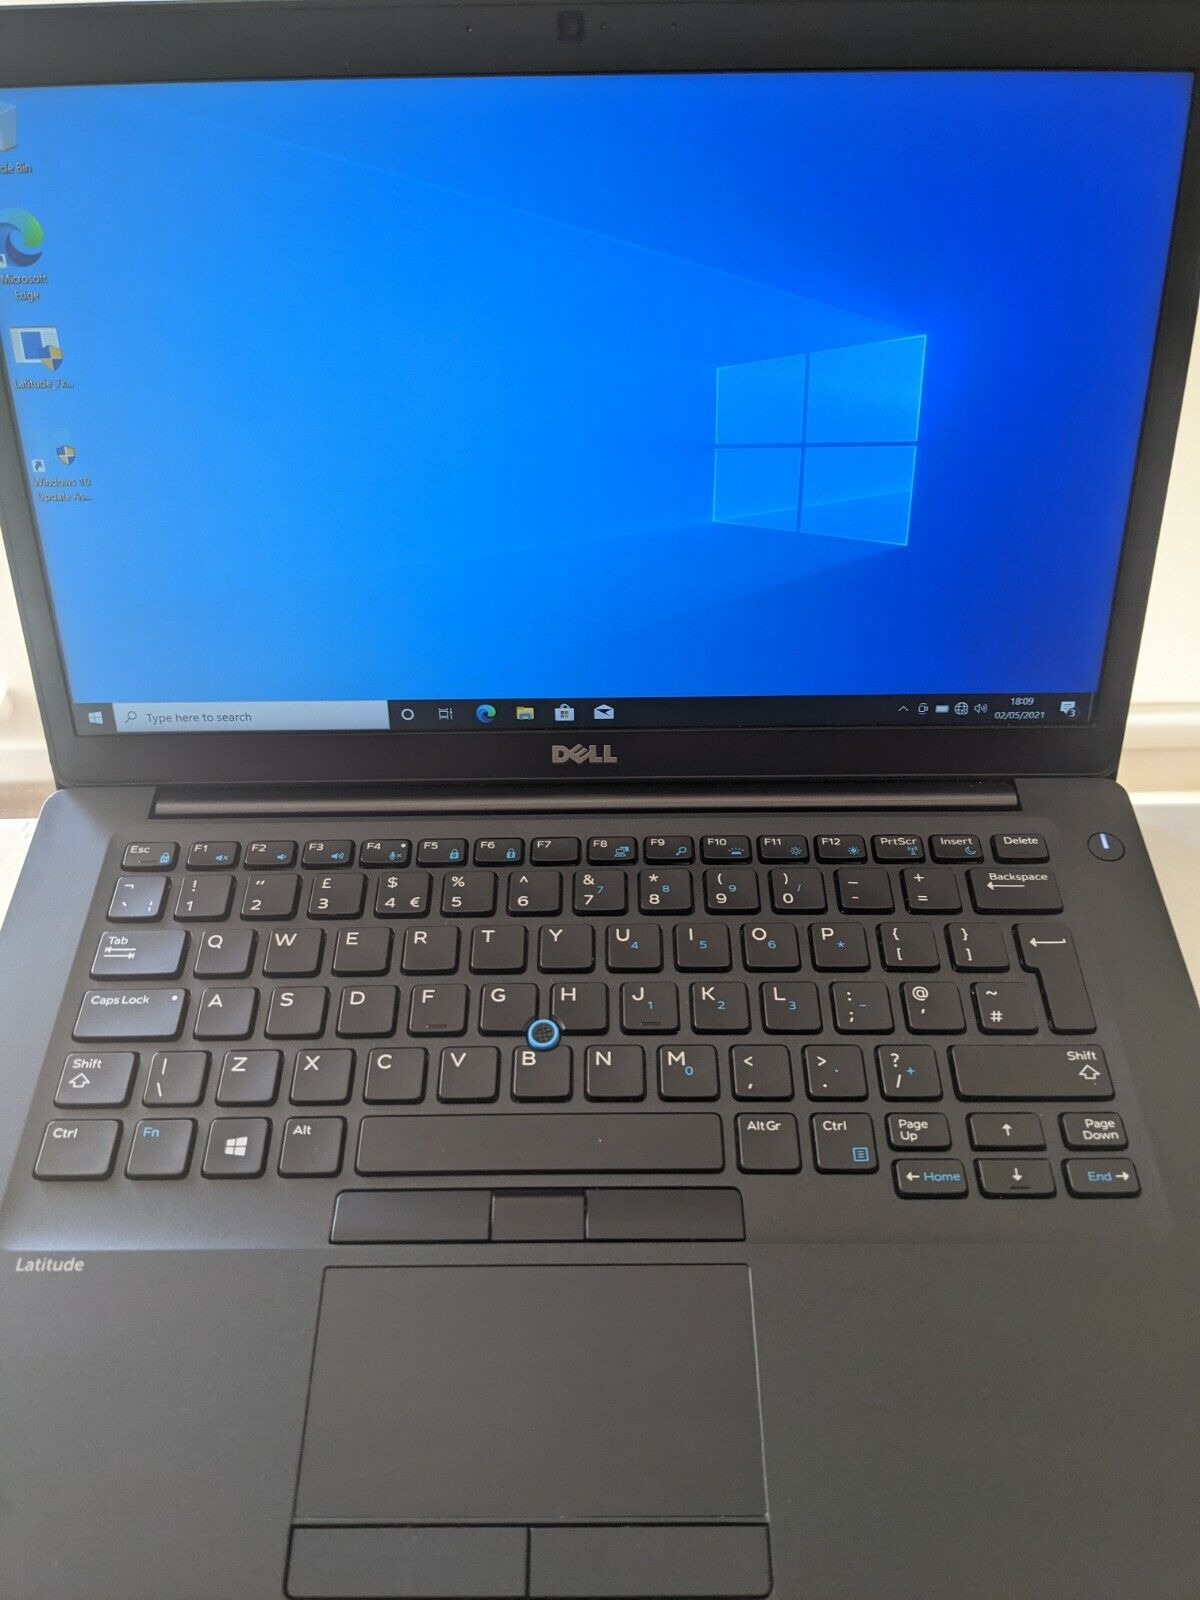 Laptop Windows - Dell Latitude 7480 - i7 CPU, 32GB RAM, 1TB SSD, Windows 10 Pro